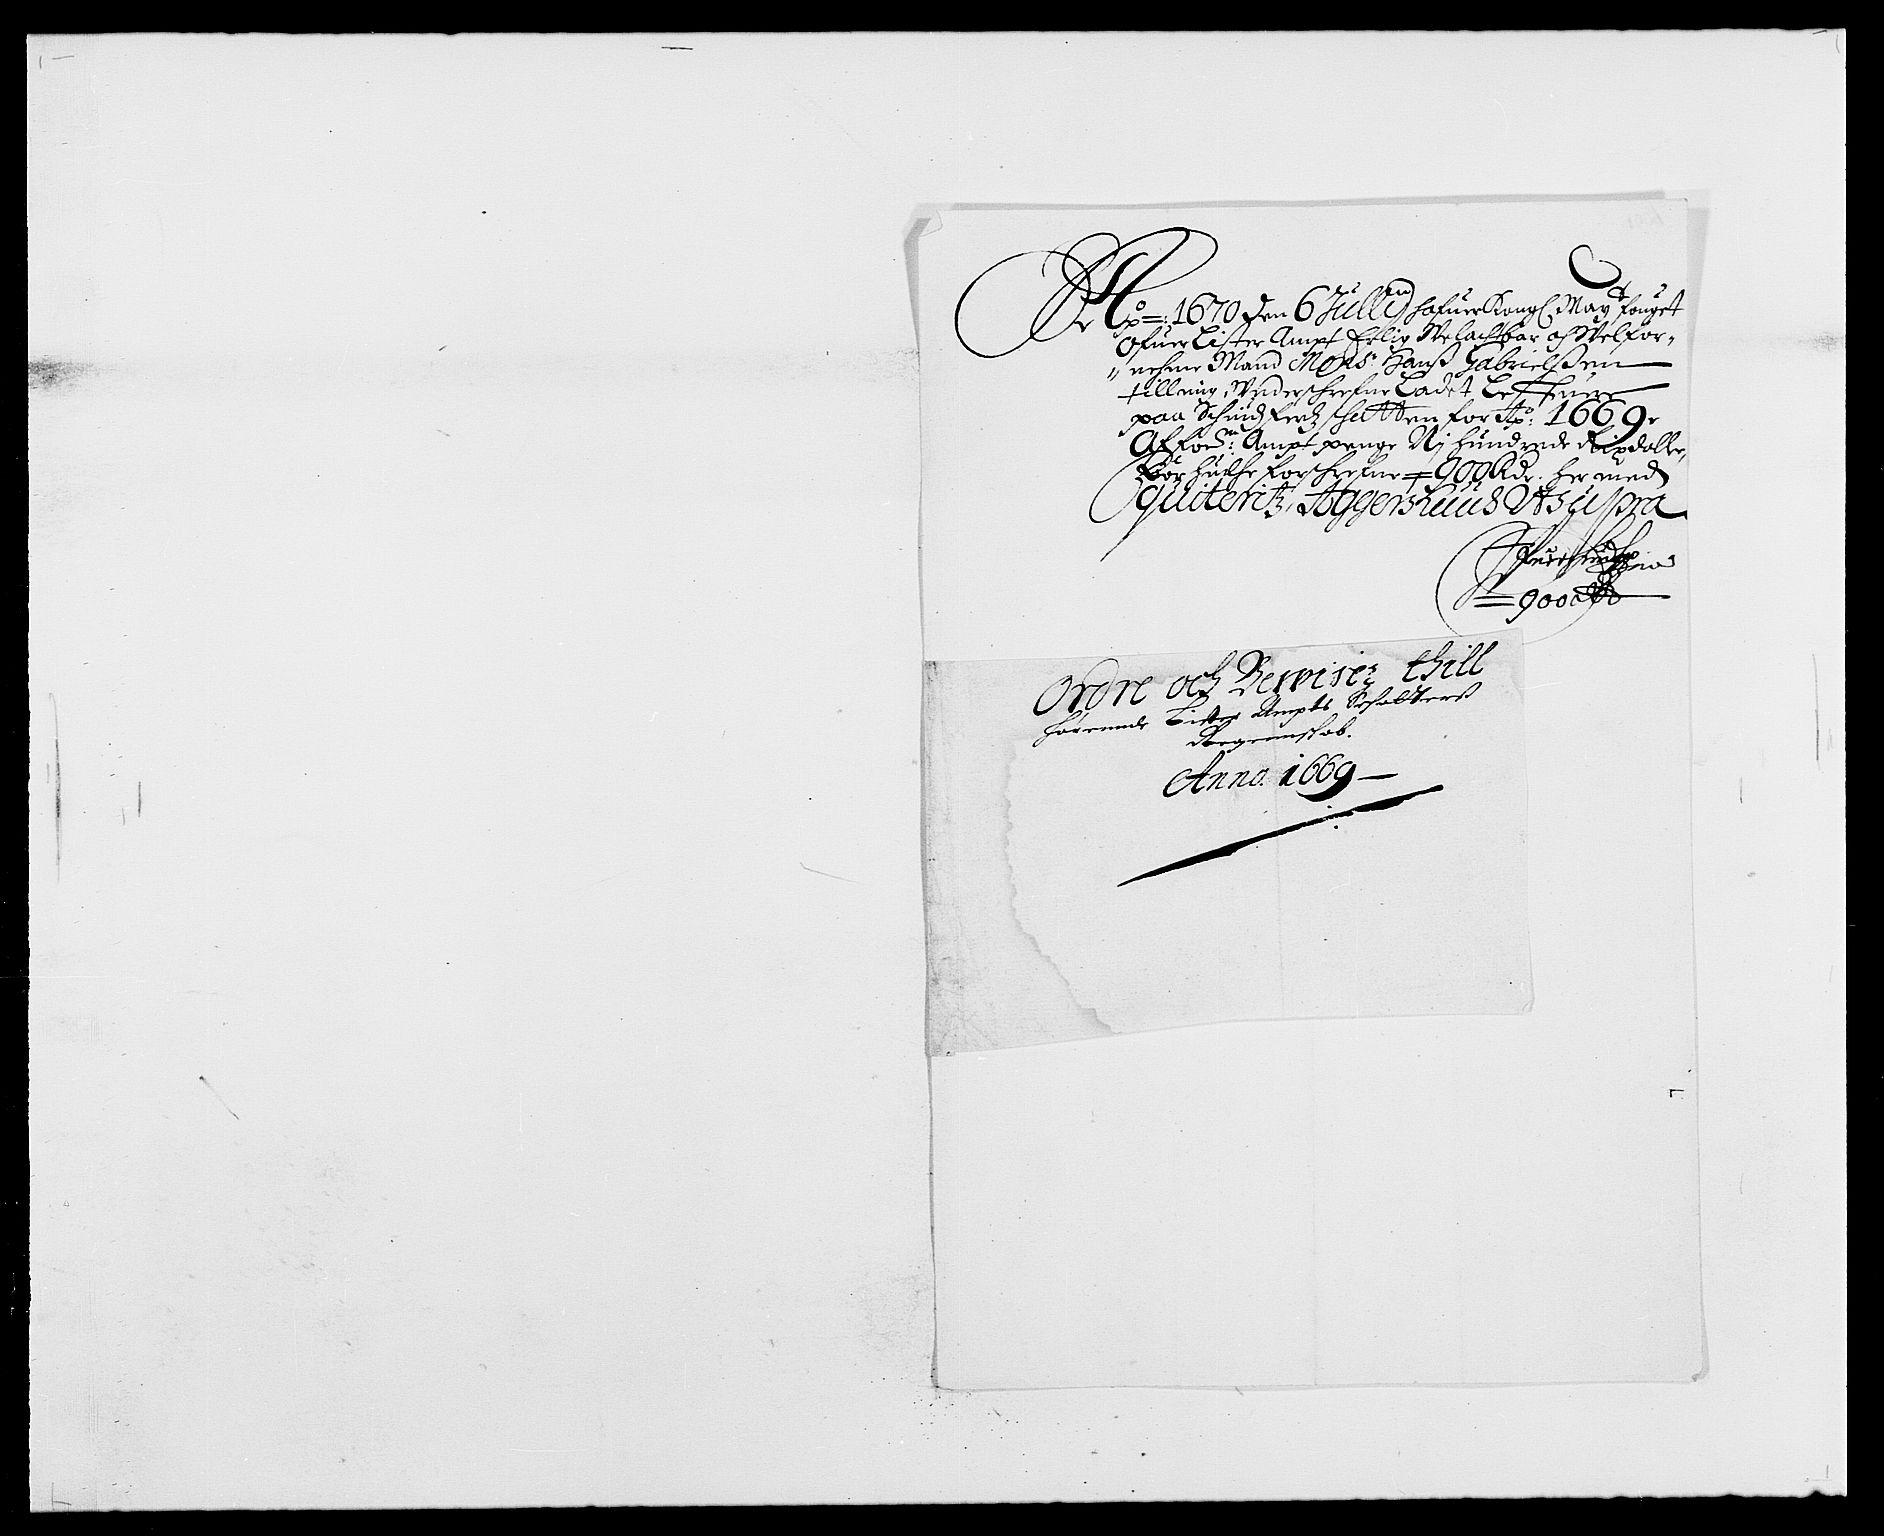 RA, Rentekammeret inntil 1814, Reviderte regnskaper, Fogderegnskap, R41/L2525: Fogderegnskap Lista, 1669-1671, s. 75